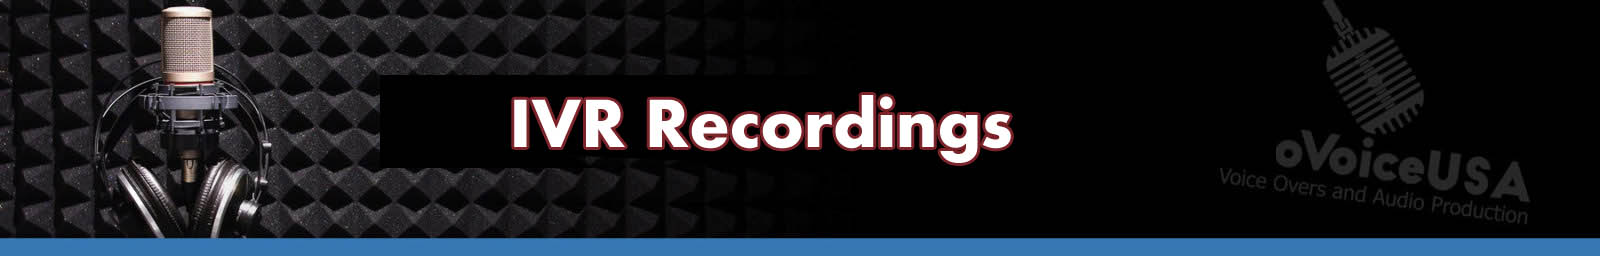 IVR Recordings | American Voice Recording Service | ProVoice USA